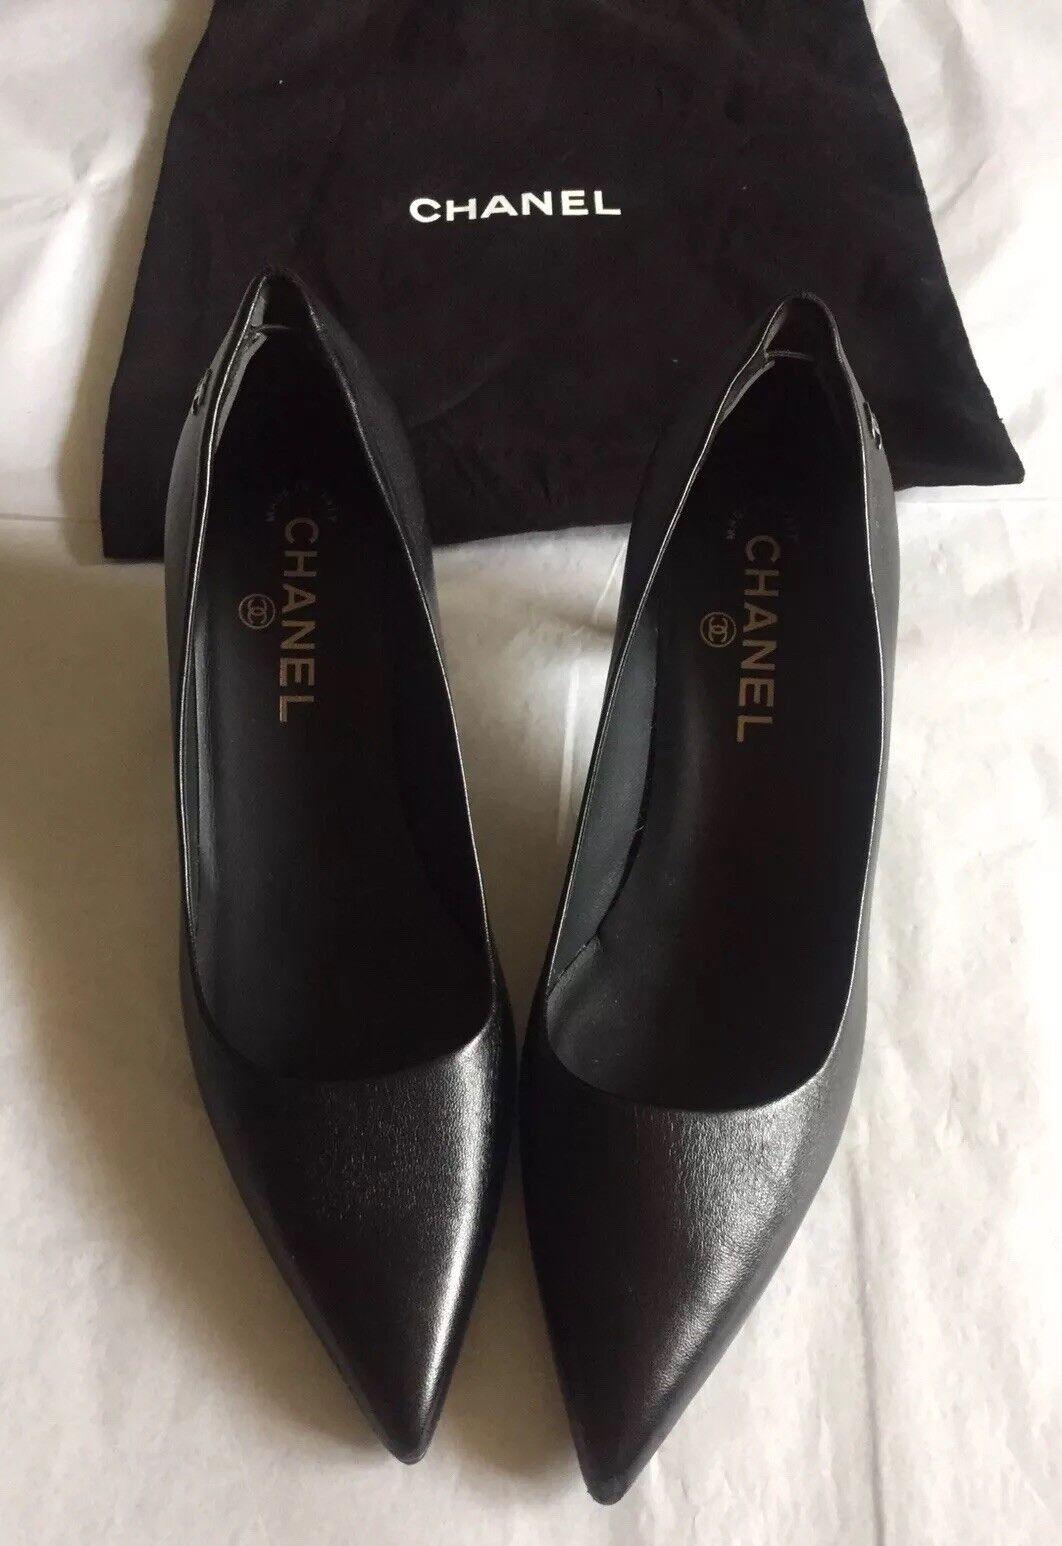 CHANAEL CC Leather Kitten Heel Pump IT  37.5  prezzo all'ingrosso